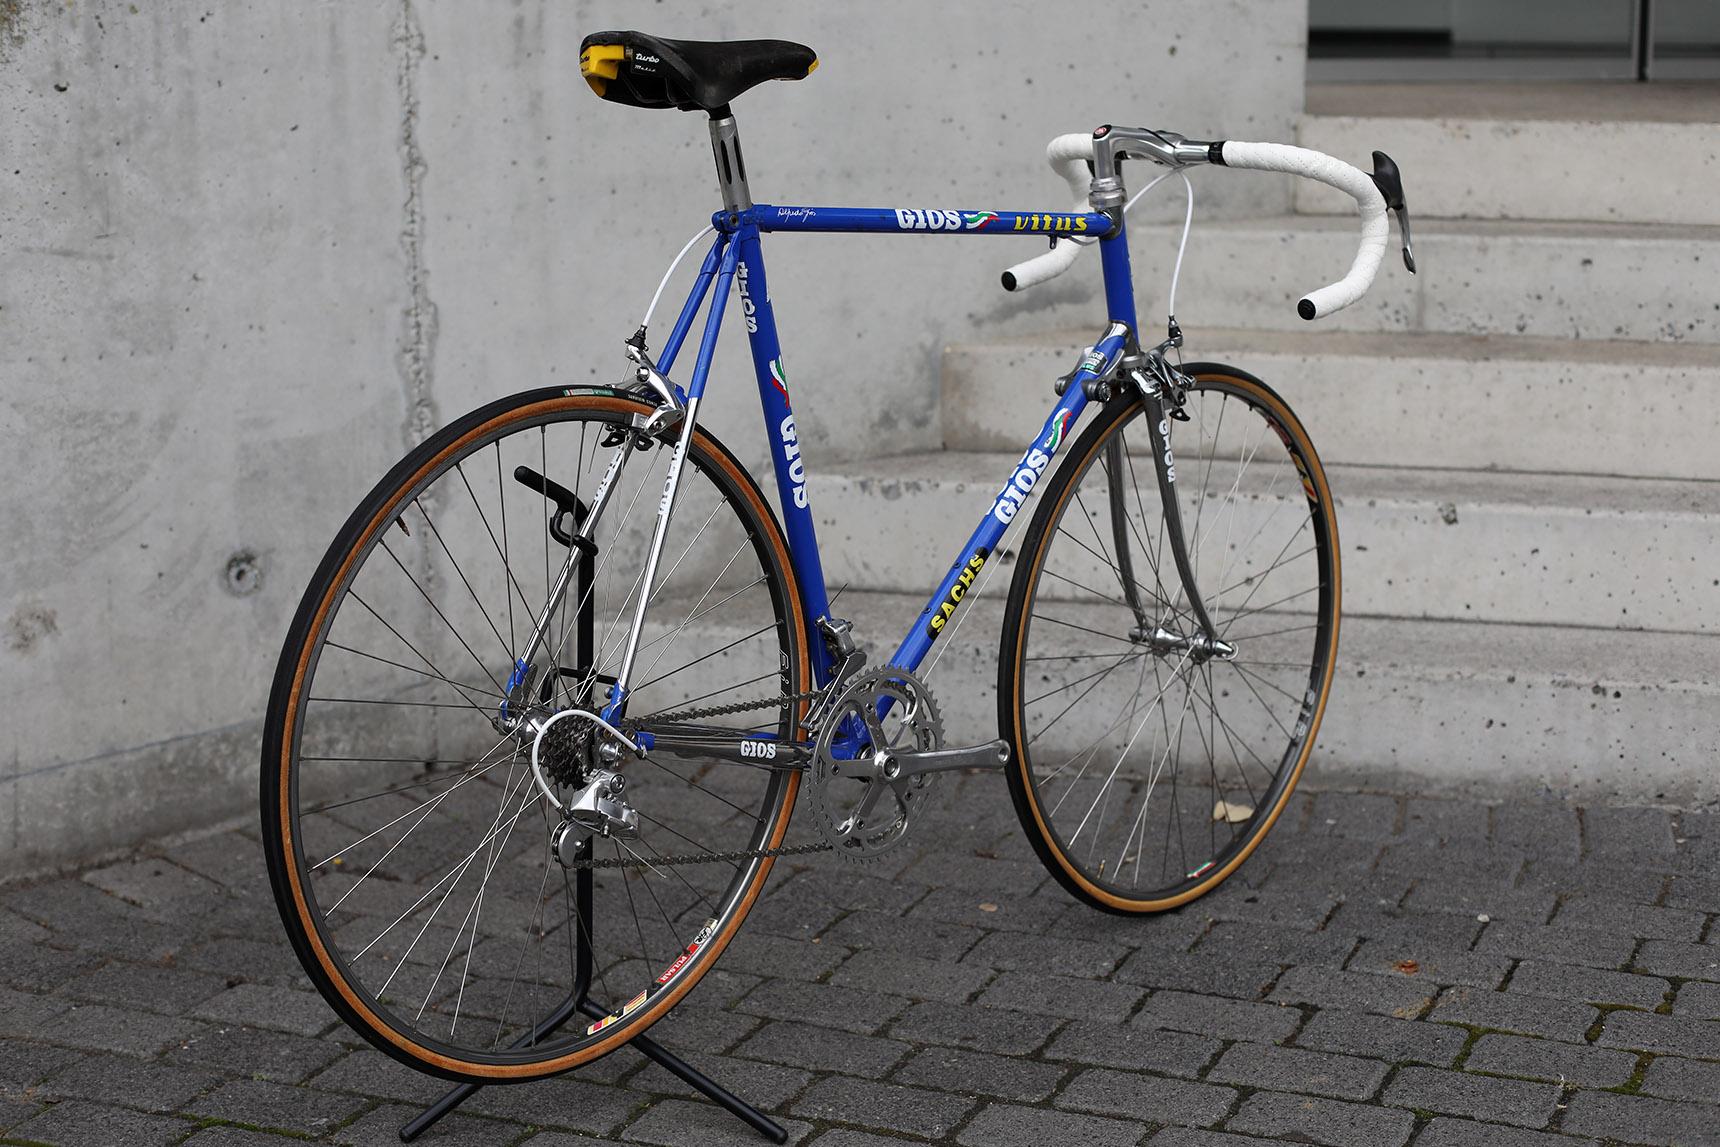 Gios Torino Compact Plus, Tonton Tapis team bike, Francis Moreau